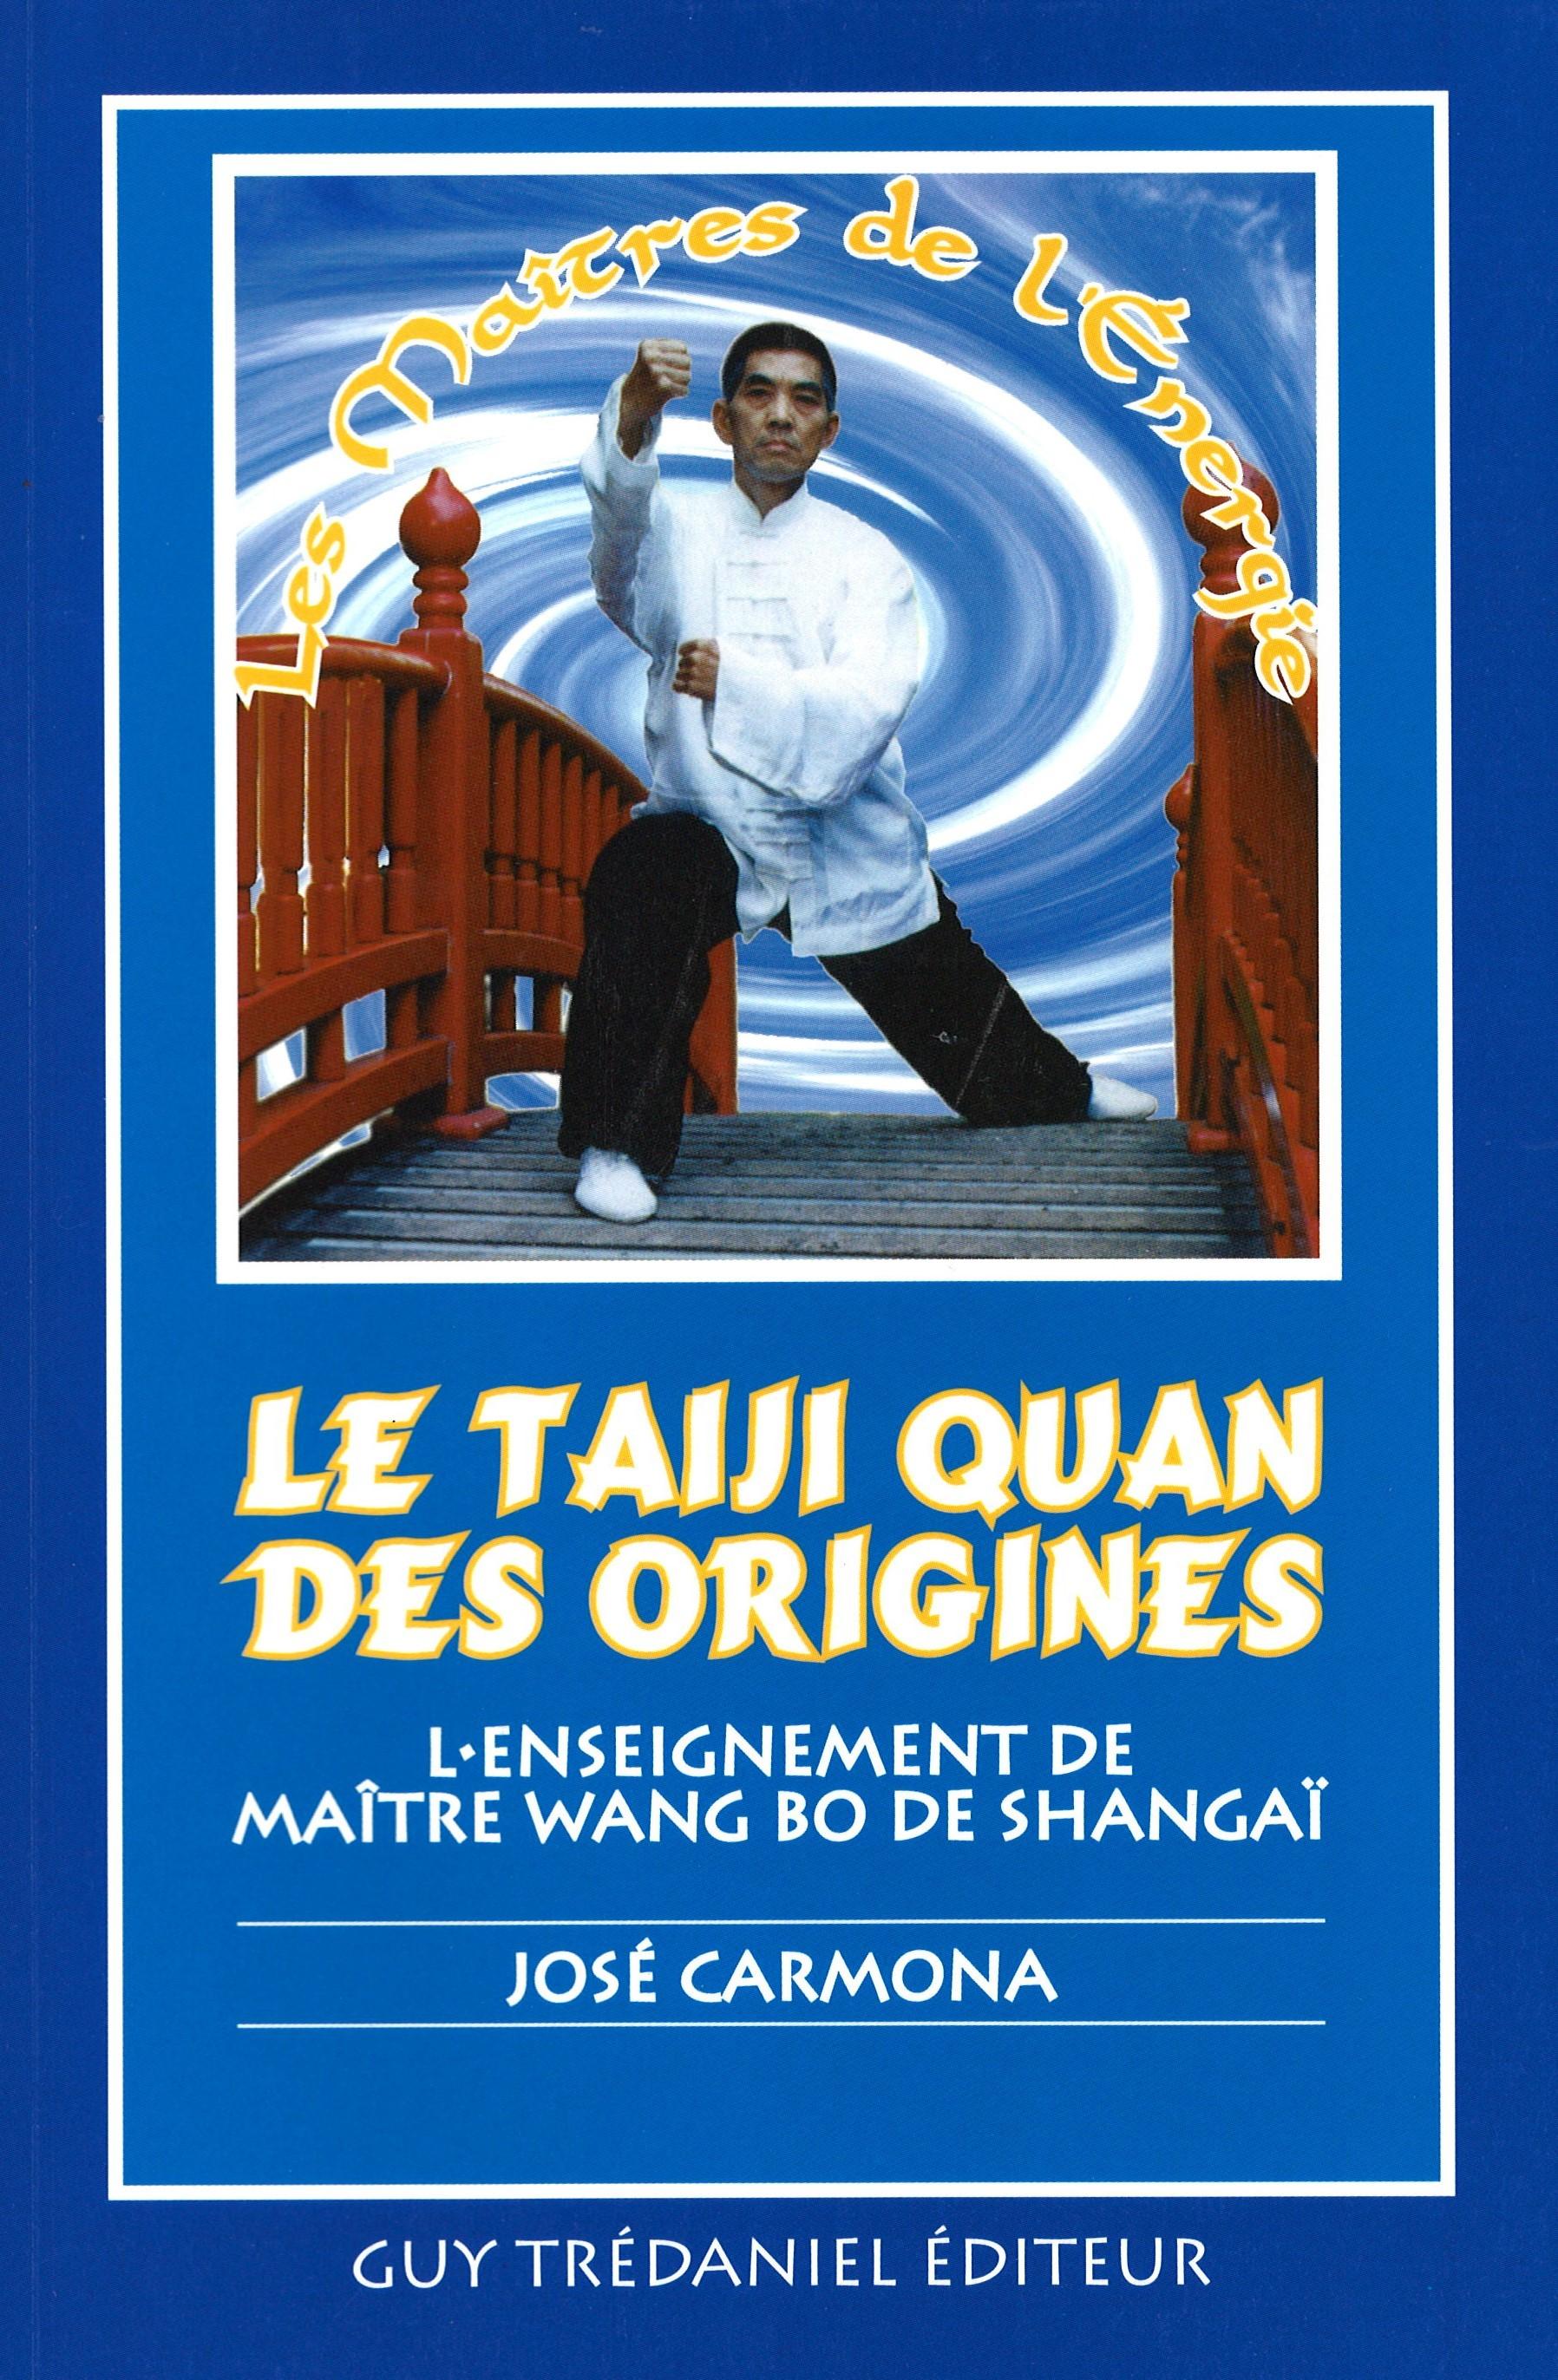 Le TAIJIQUAN des origines